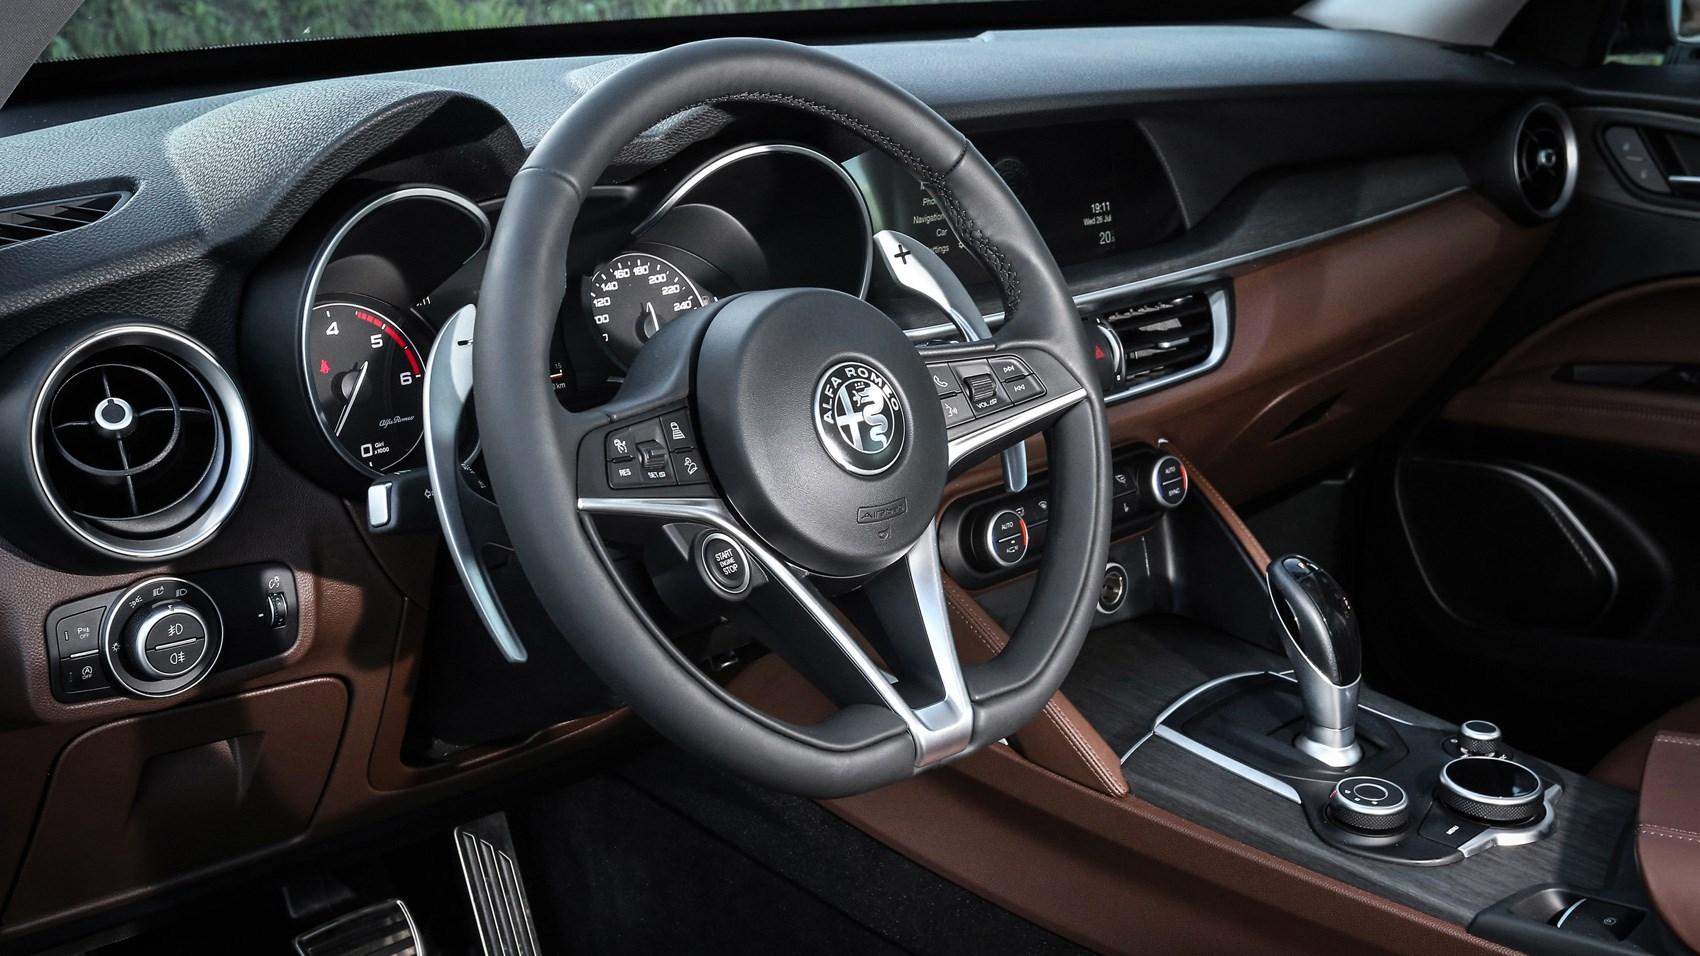 Alfa Romeo Stelvio Steering Wheel >> Alfa Romeo Stelvio (2017) review by CAR Magazine